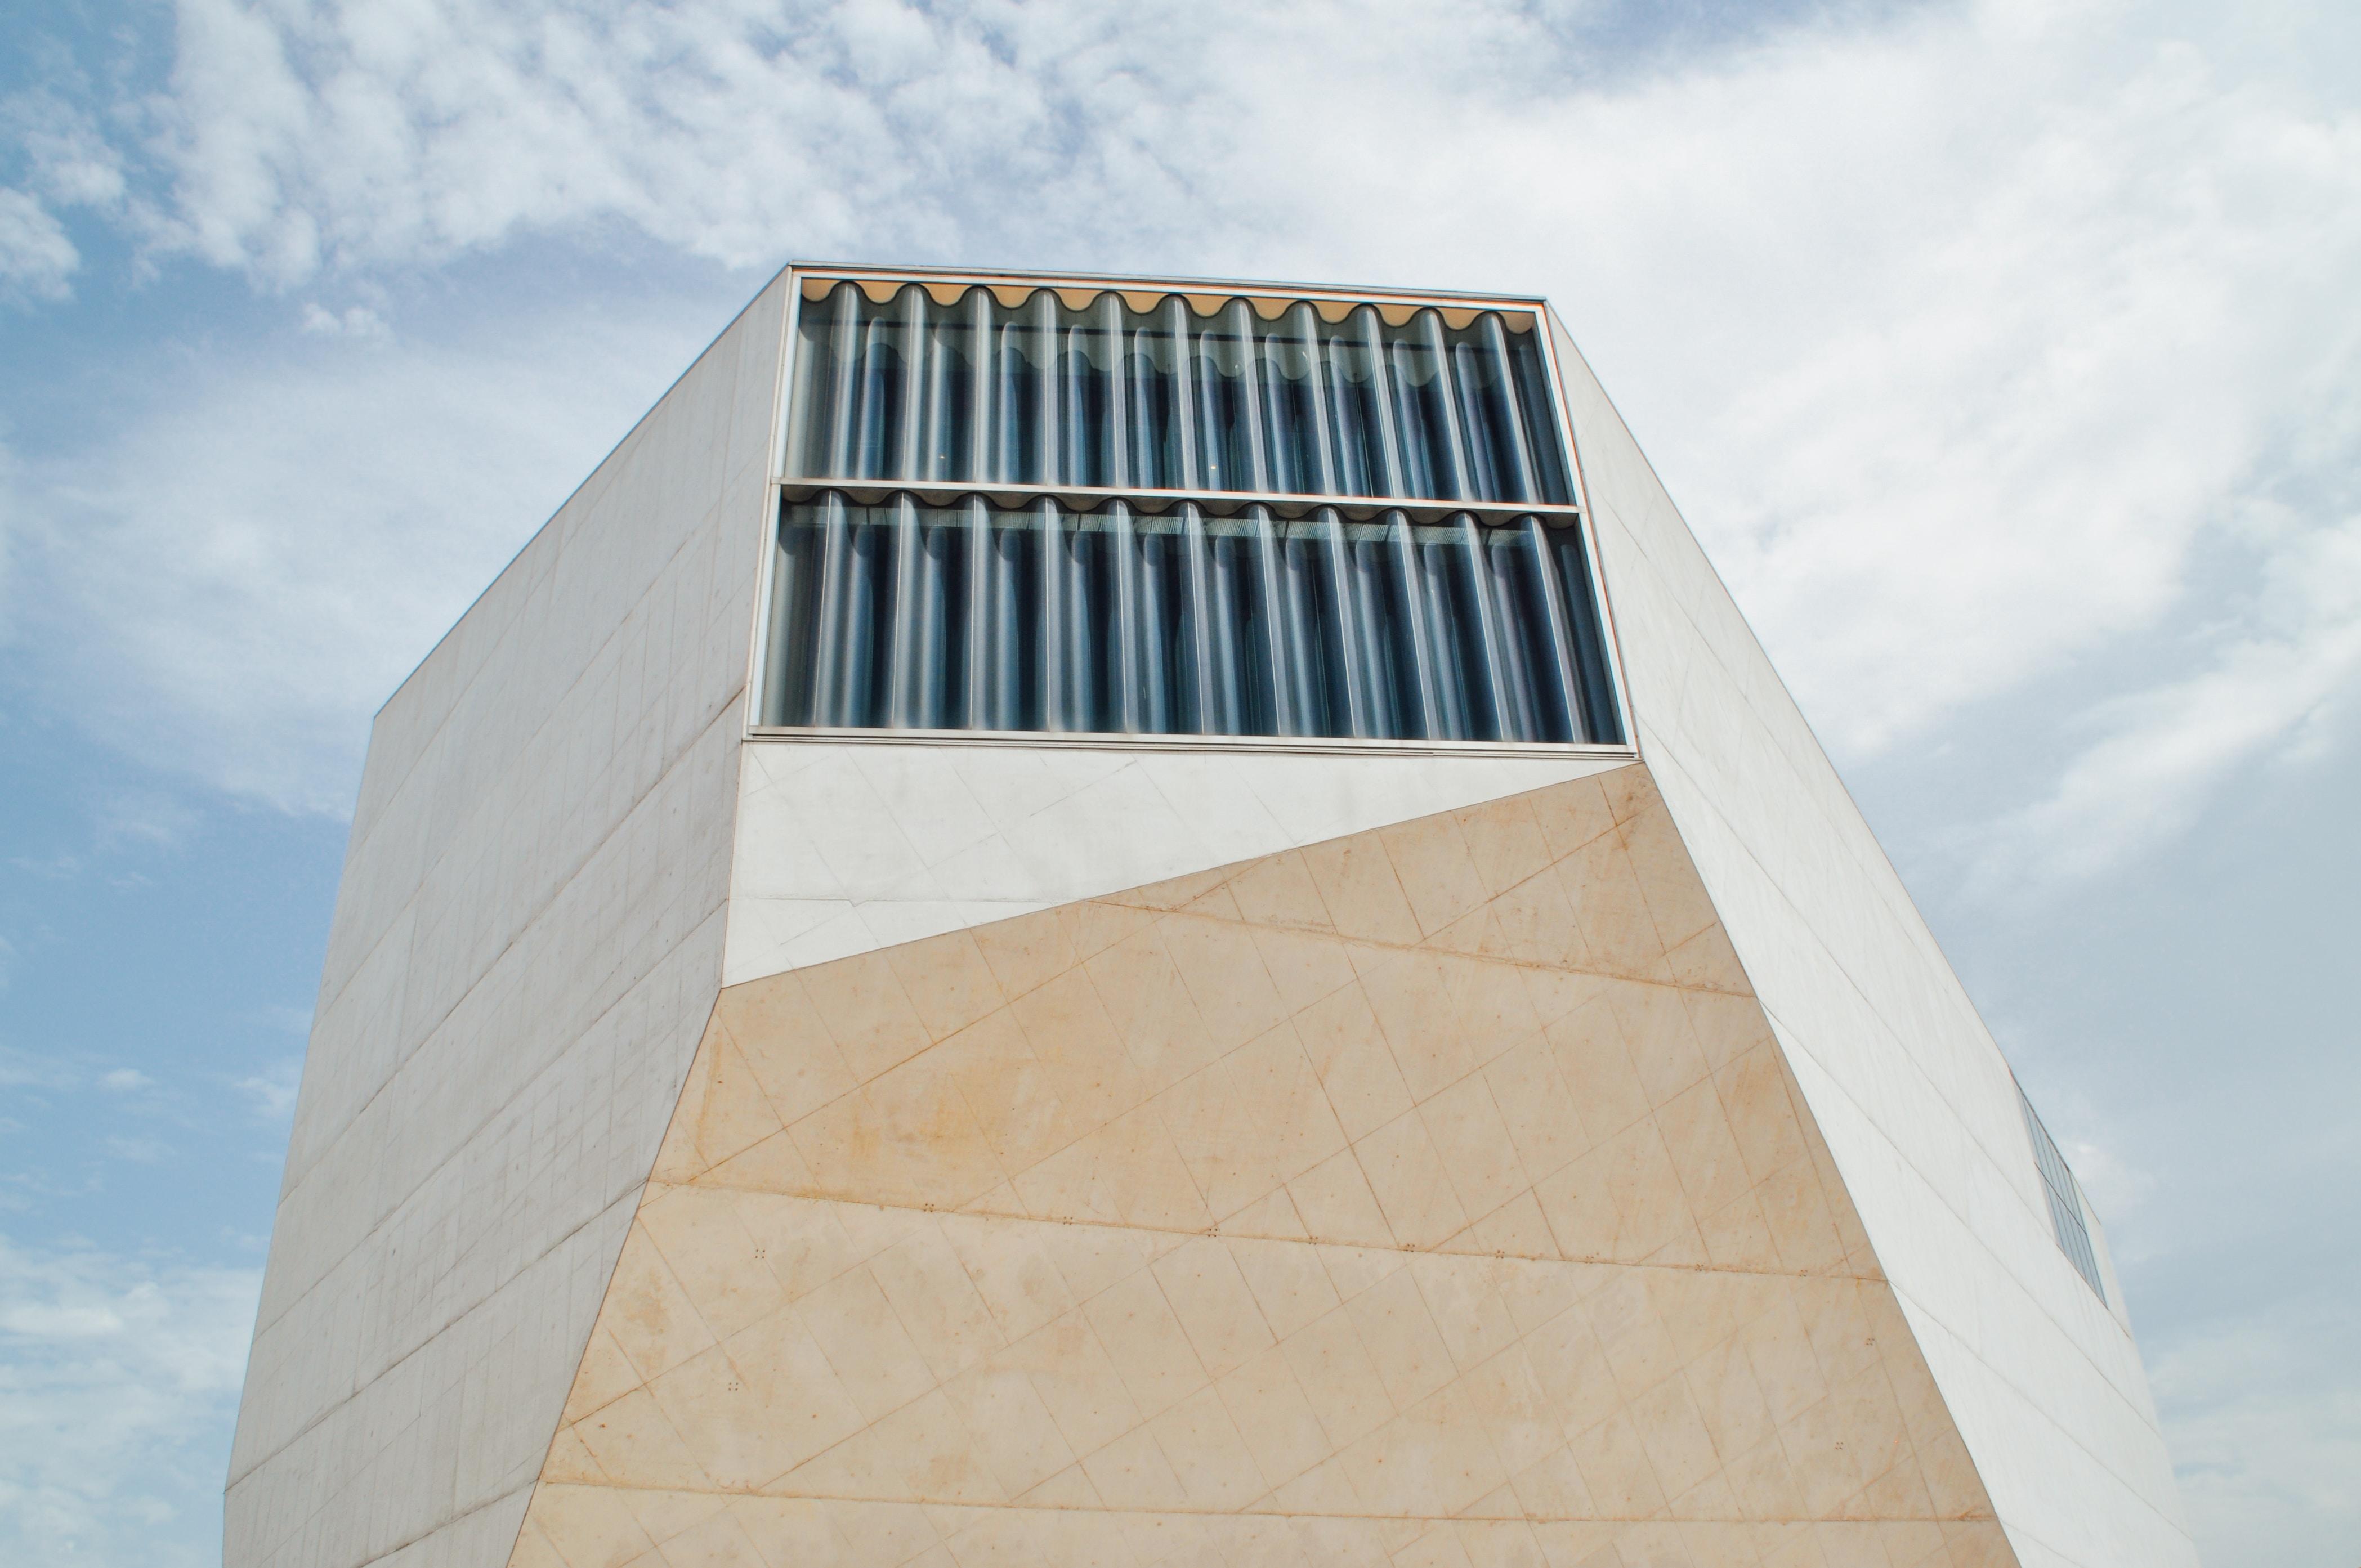 An undulating window at the top of an angular building facade